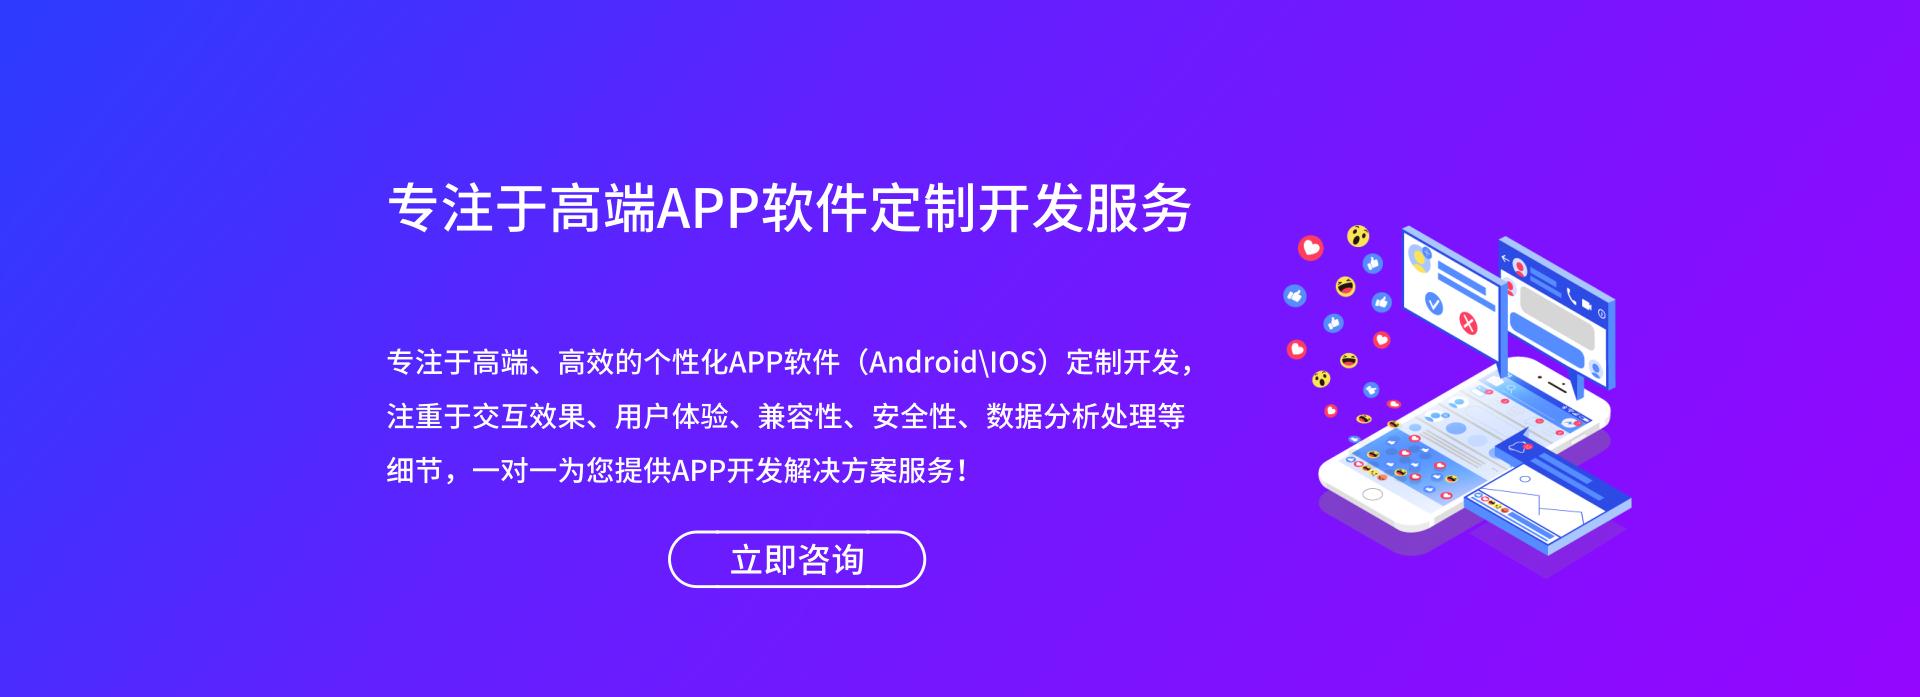 APP软件定制开发服务,iOS开发,android开发